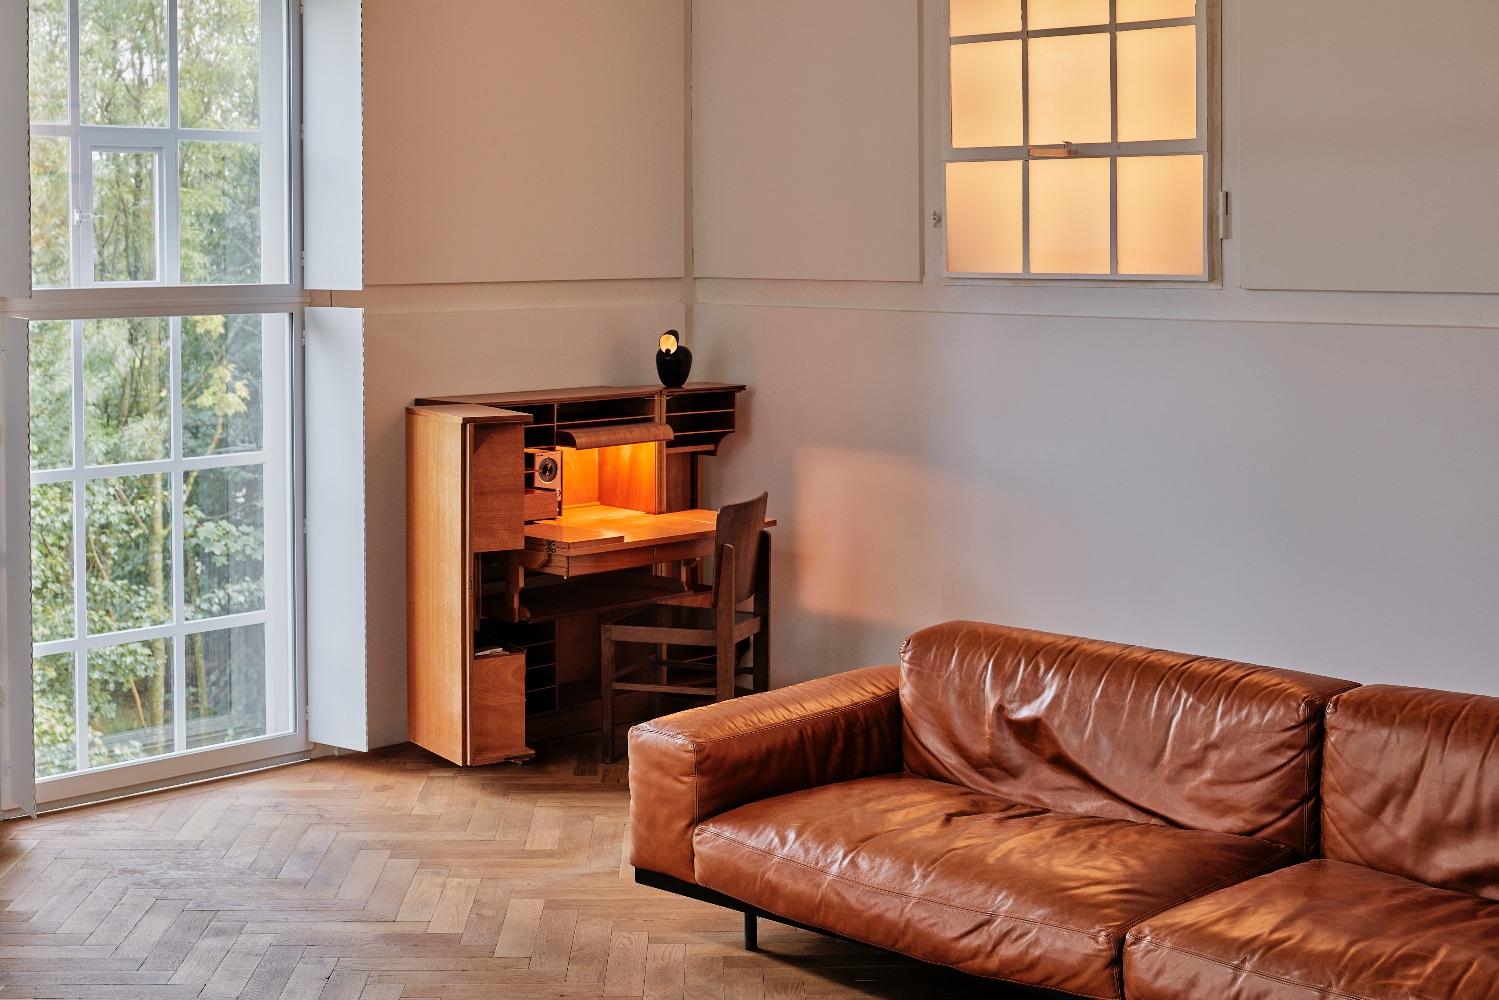 7_Studio Modijefsky_Ketelhuis_Residence_Inspirationist